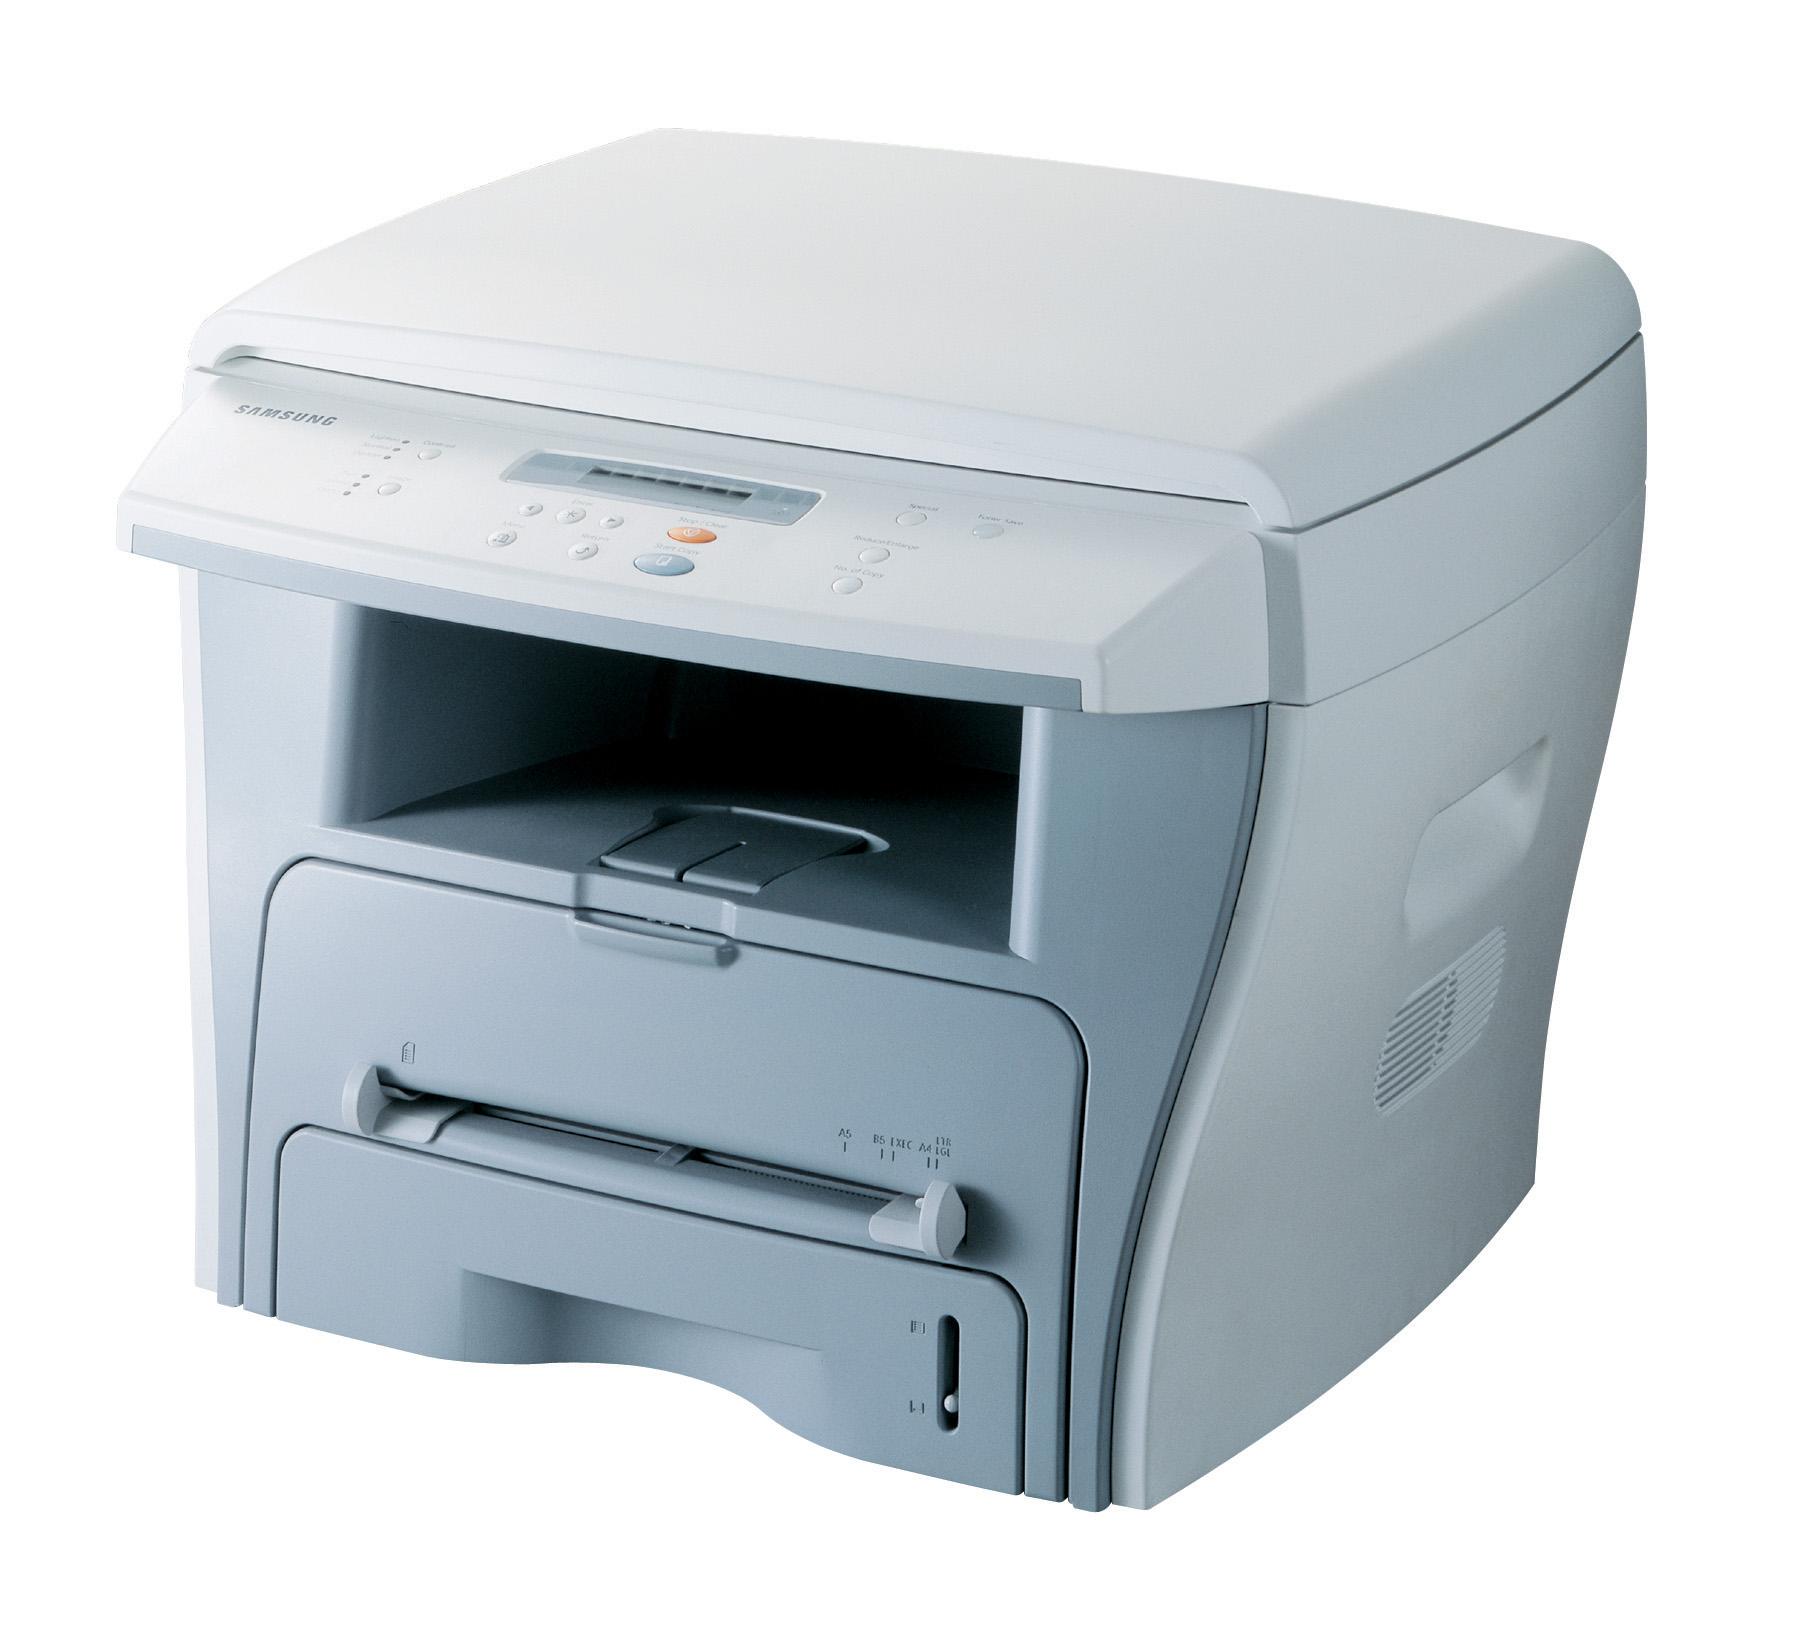 Принтер Samsung SCX-4016